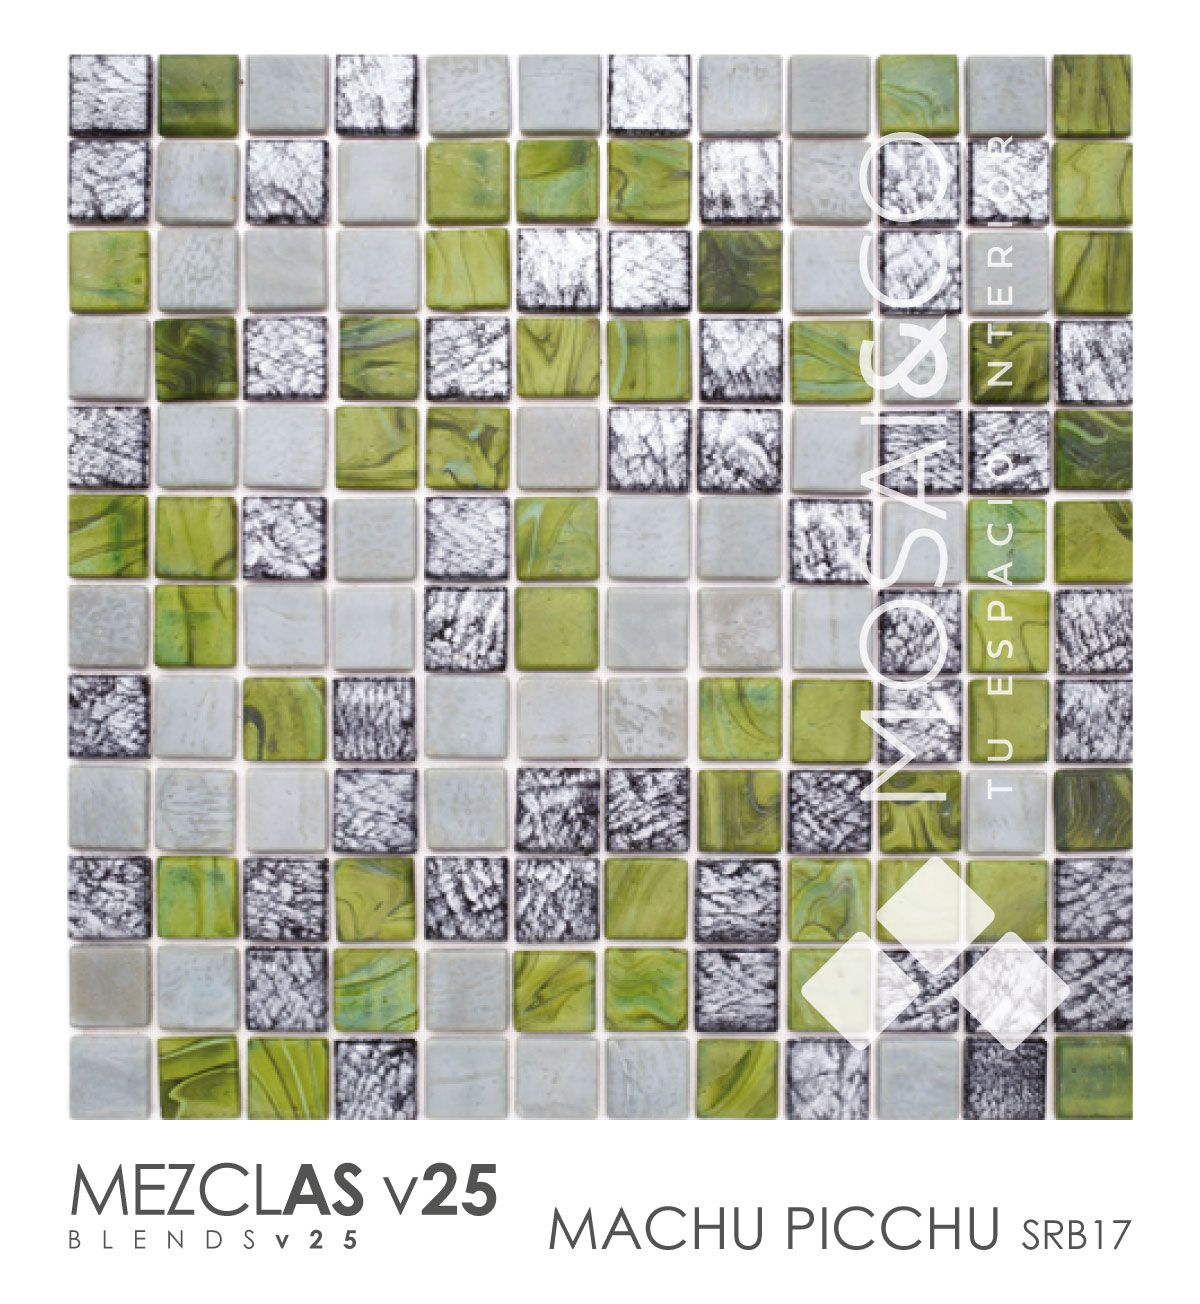 Mezclas-v25-MosaiCo-MACHU-PICCHU-SRB17